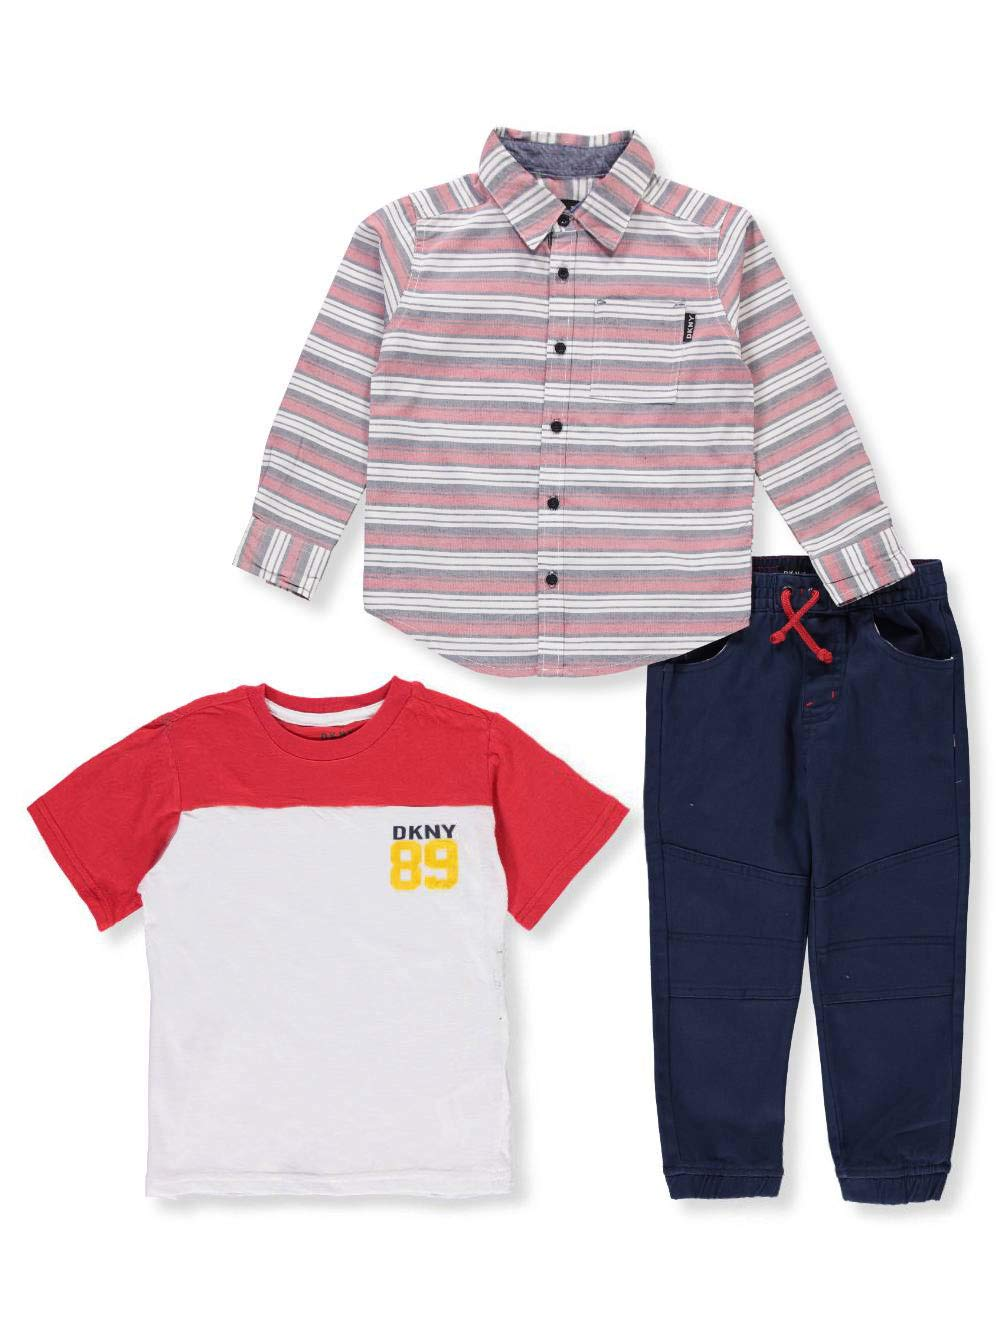 DKNY Little Boys' Manhattan Sport Shirt, T-Shirt and Jog Pant, Dress Blues, 5